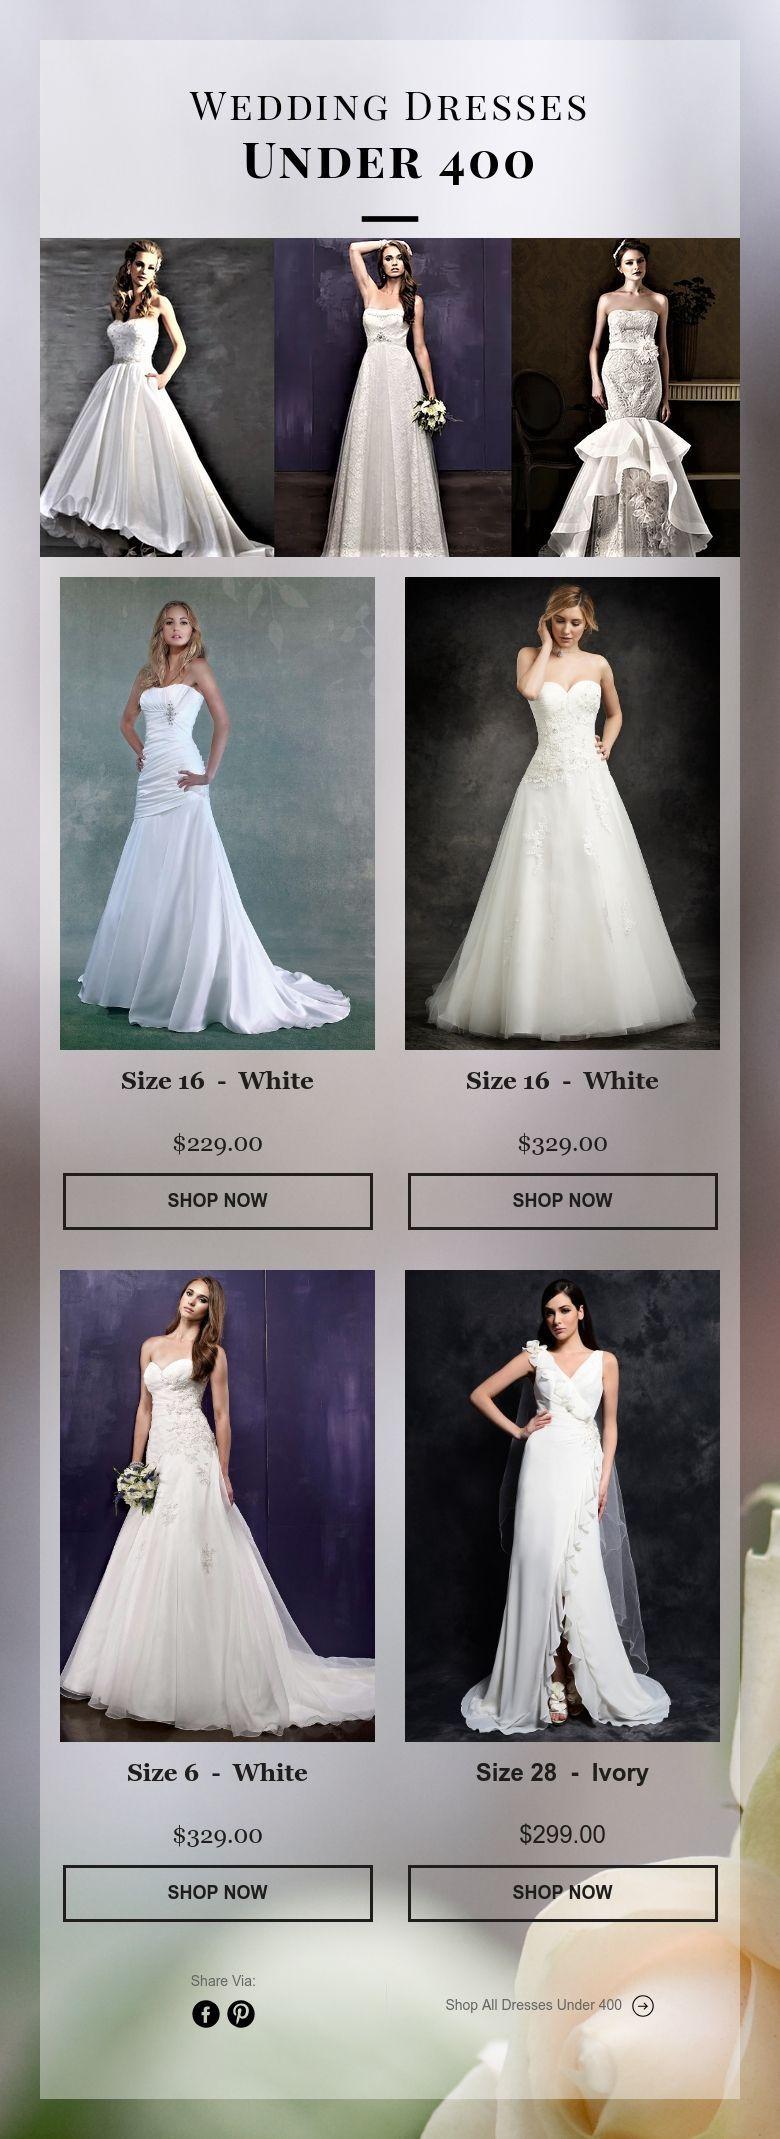 Wedding Dresses Under 400 New Never Worn Or Altered Www Bridaloutletofamerica Com Long Beach Wedding Dresses Long Bridal Gown Ball Gowns Wedding